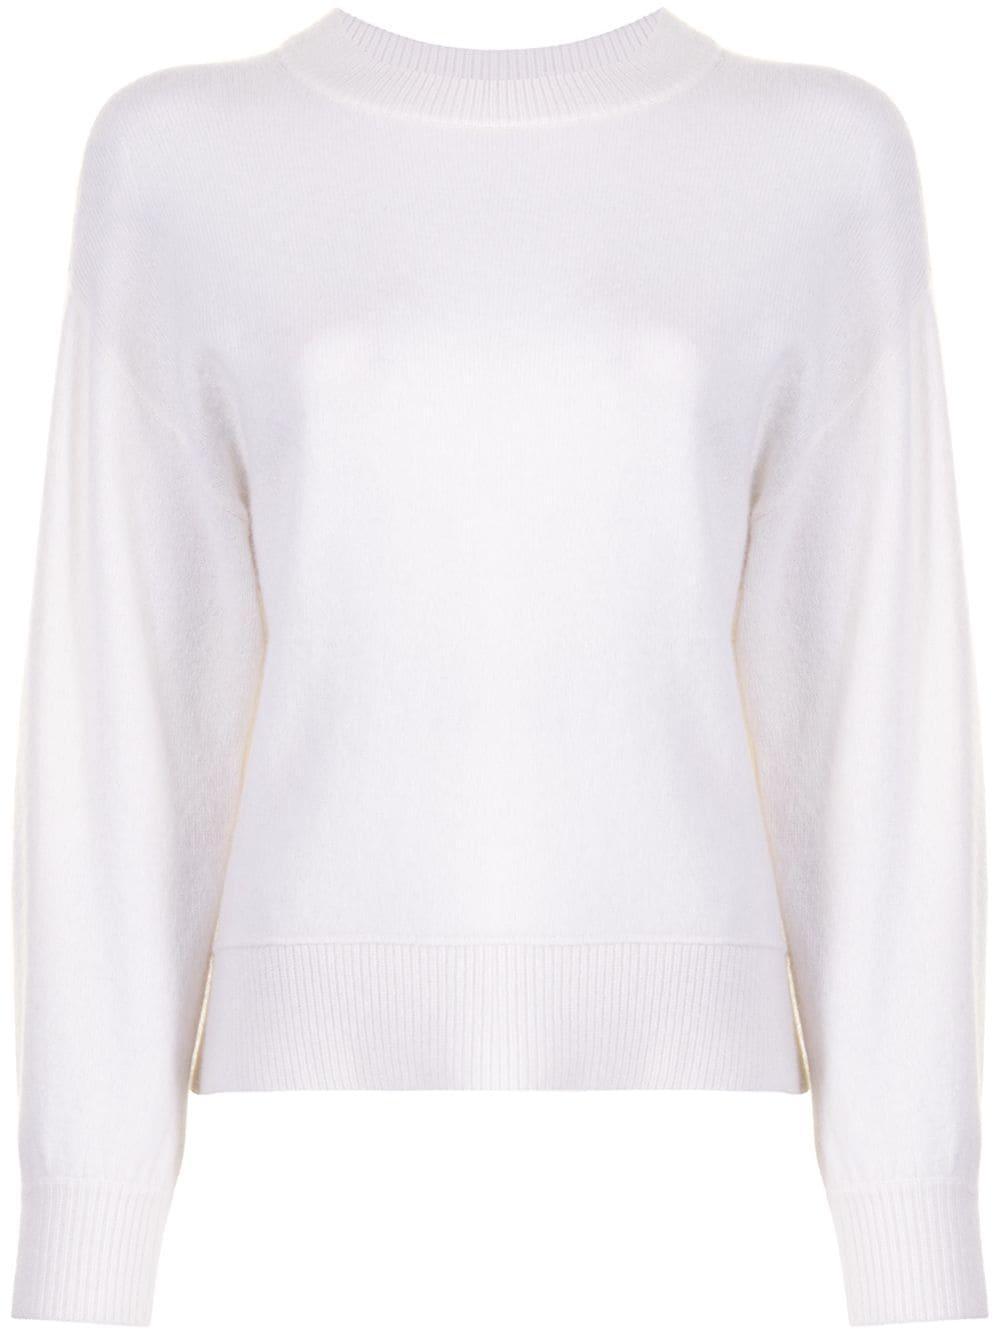 Denver Cashmere Sweater Item # CL000S35714